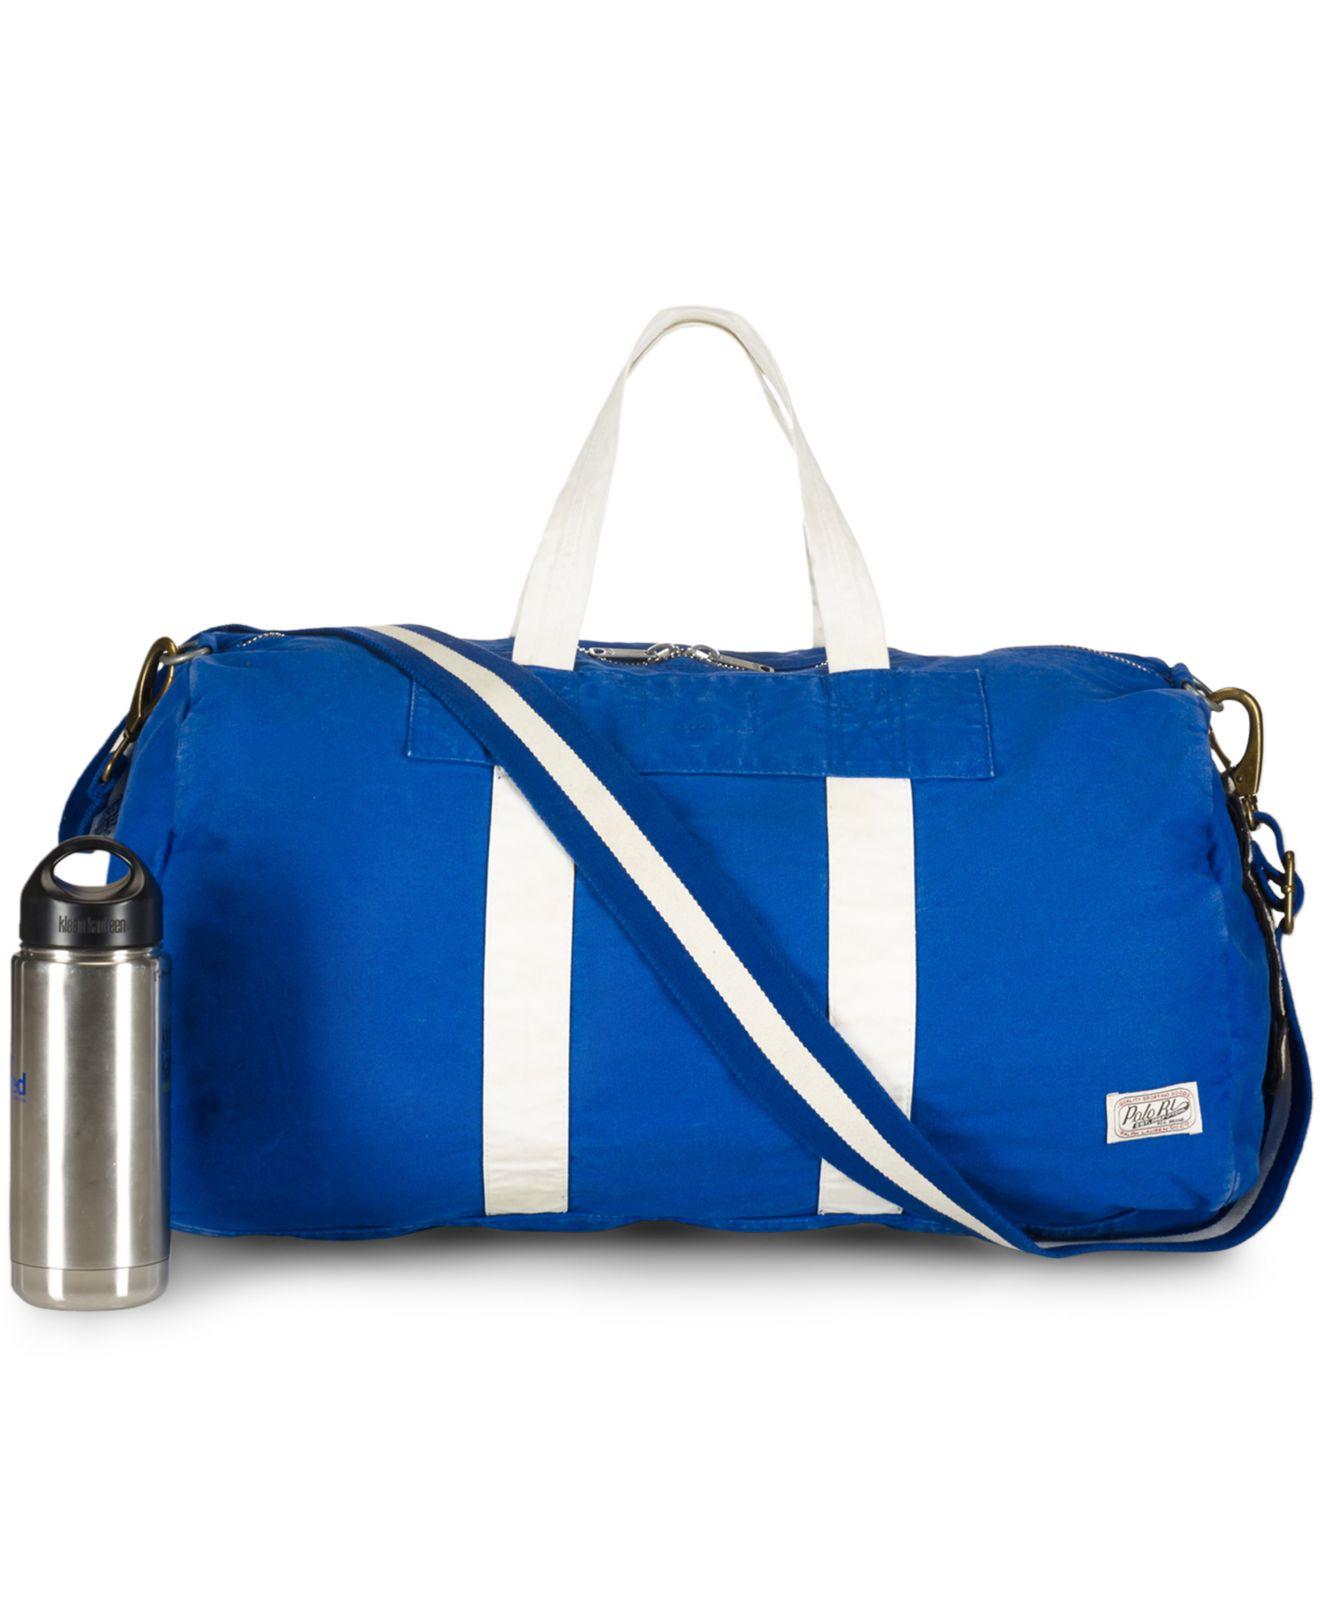 4bc4f82654 ... canada lyst polo ralph lauren canvas football duffel bag in blue for  men ef523 44ca2